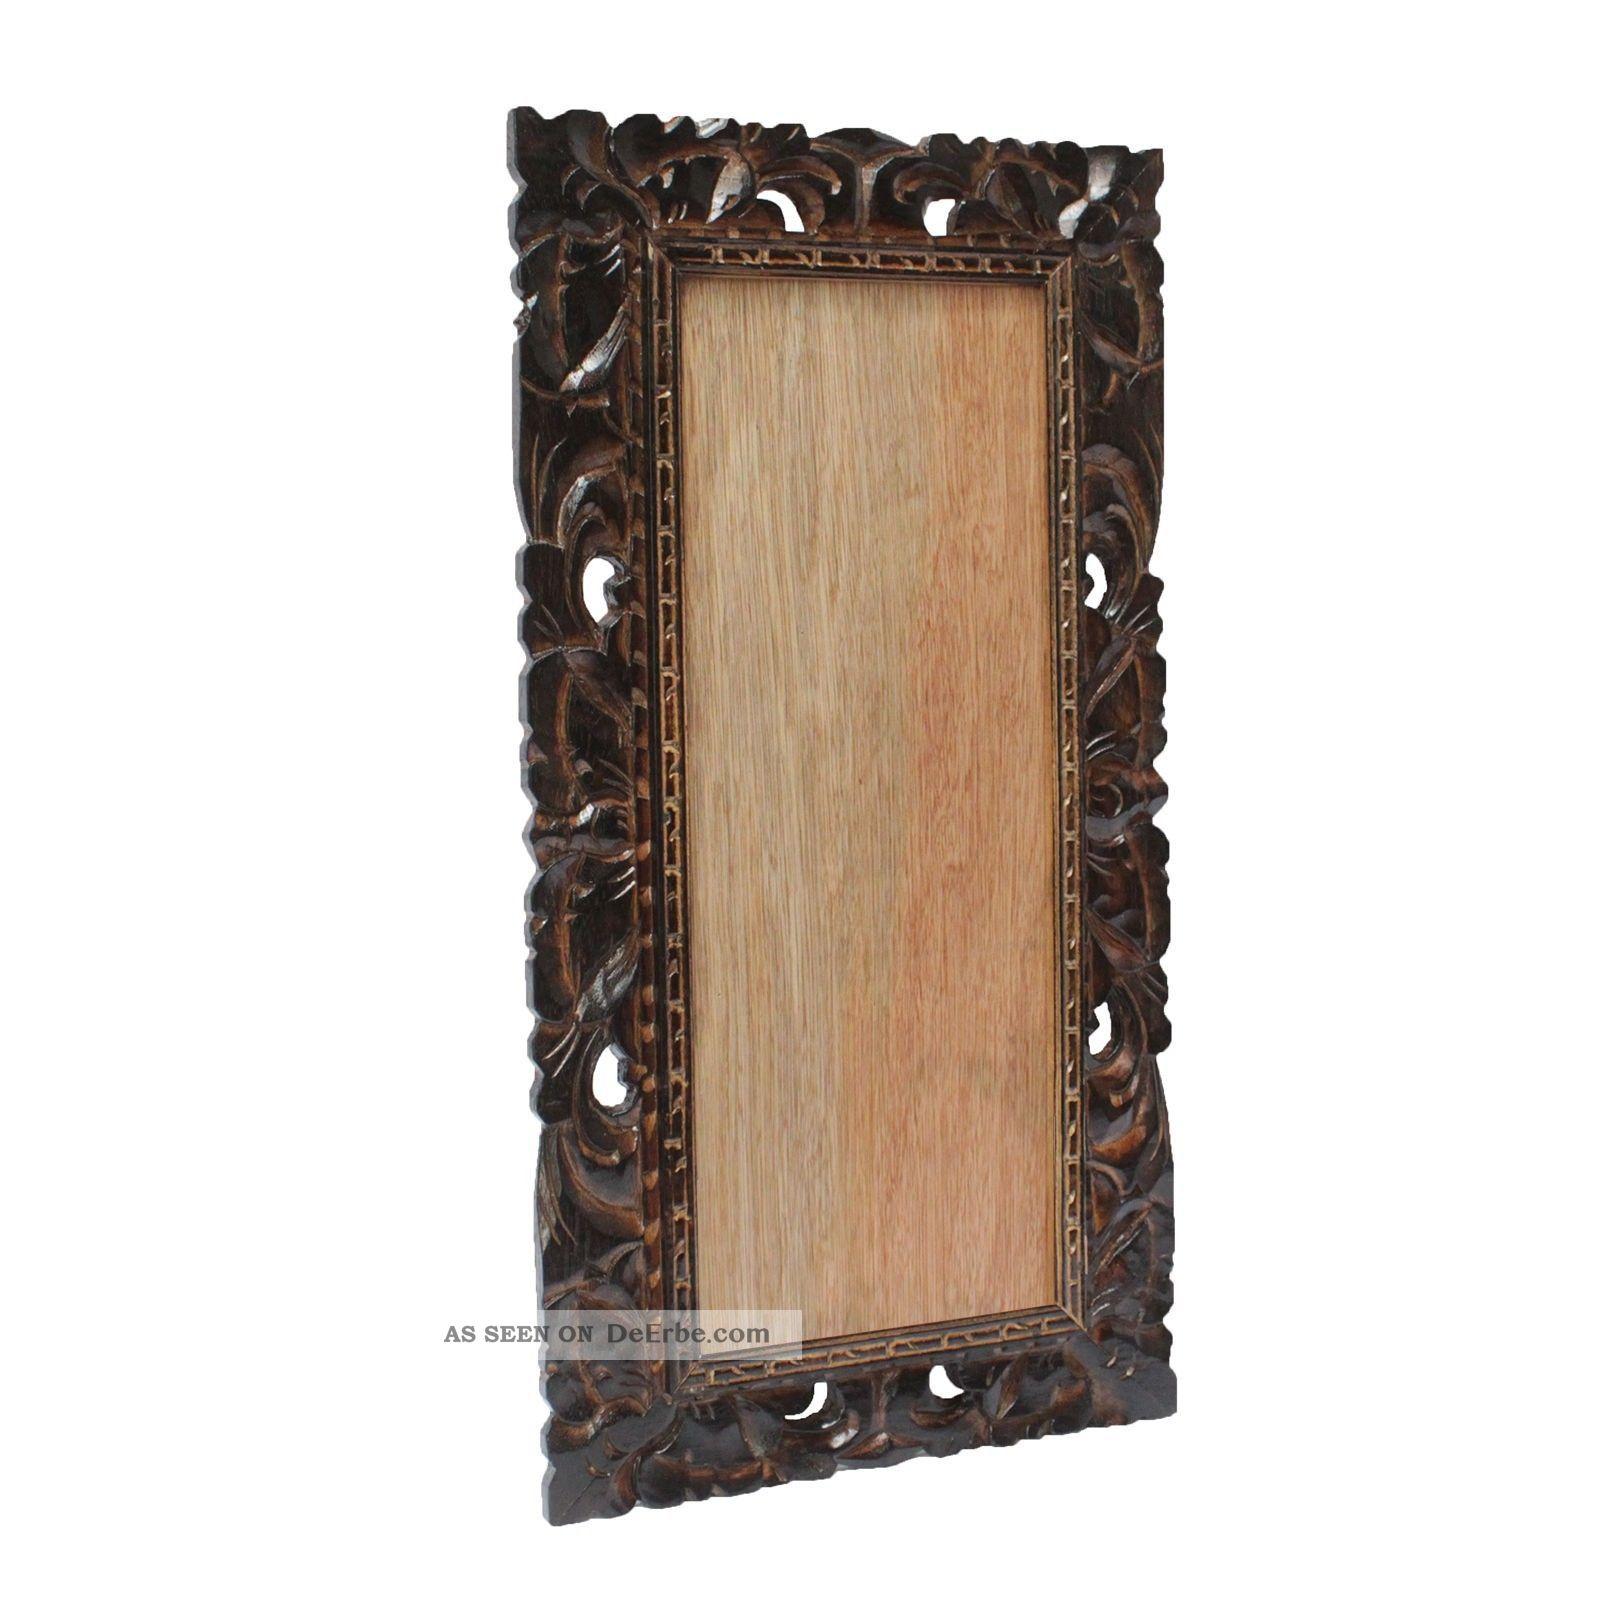 bilderrahmen holz braun 20x50 foto rahmen schnitzerei wand deko echt dunkel glas. Black Bedroom Furniture Sets. Home Design Ideas